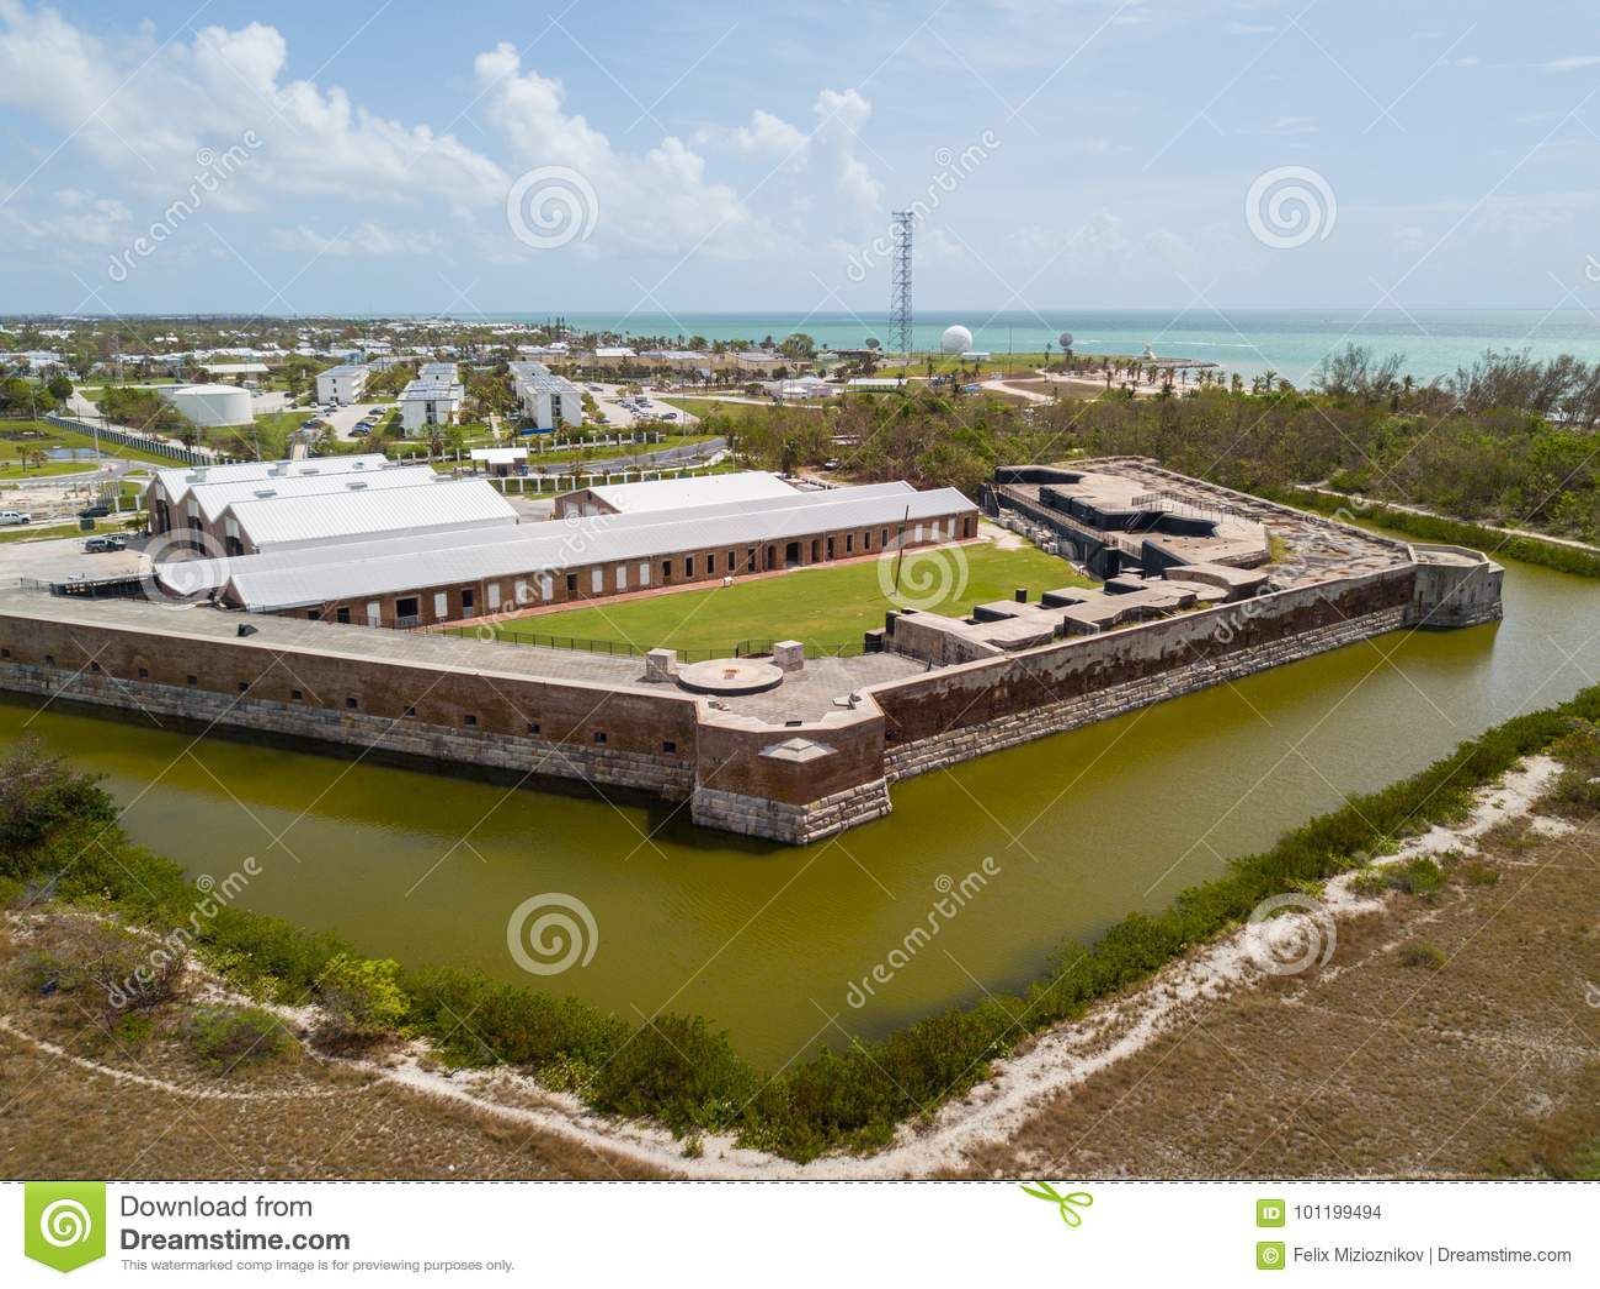 Fort-Zachary Taylor Key West-Antennenbild